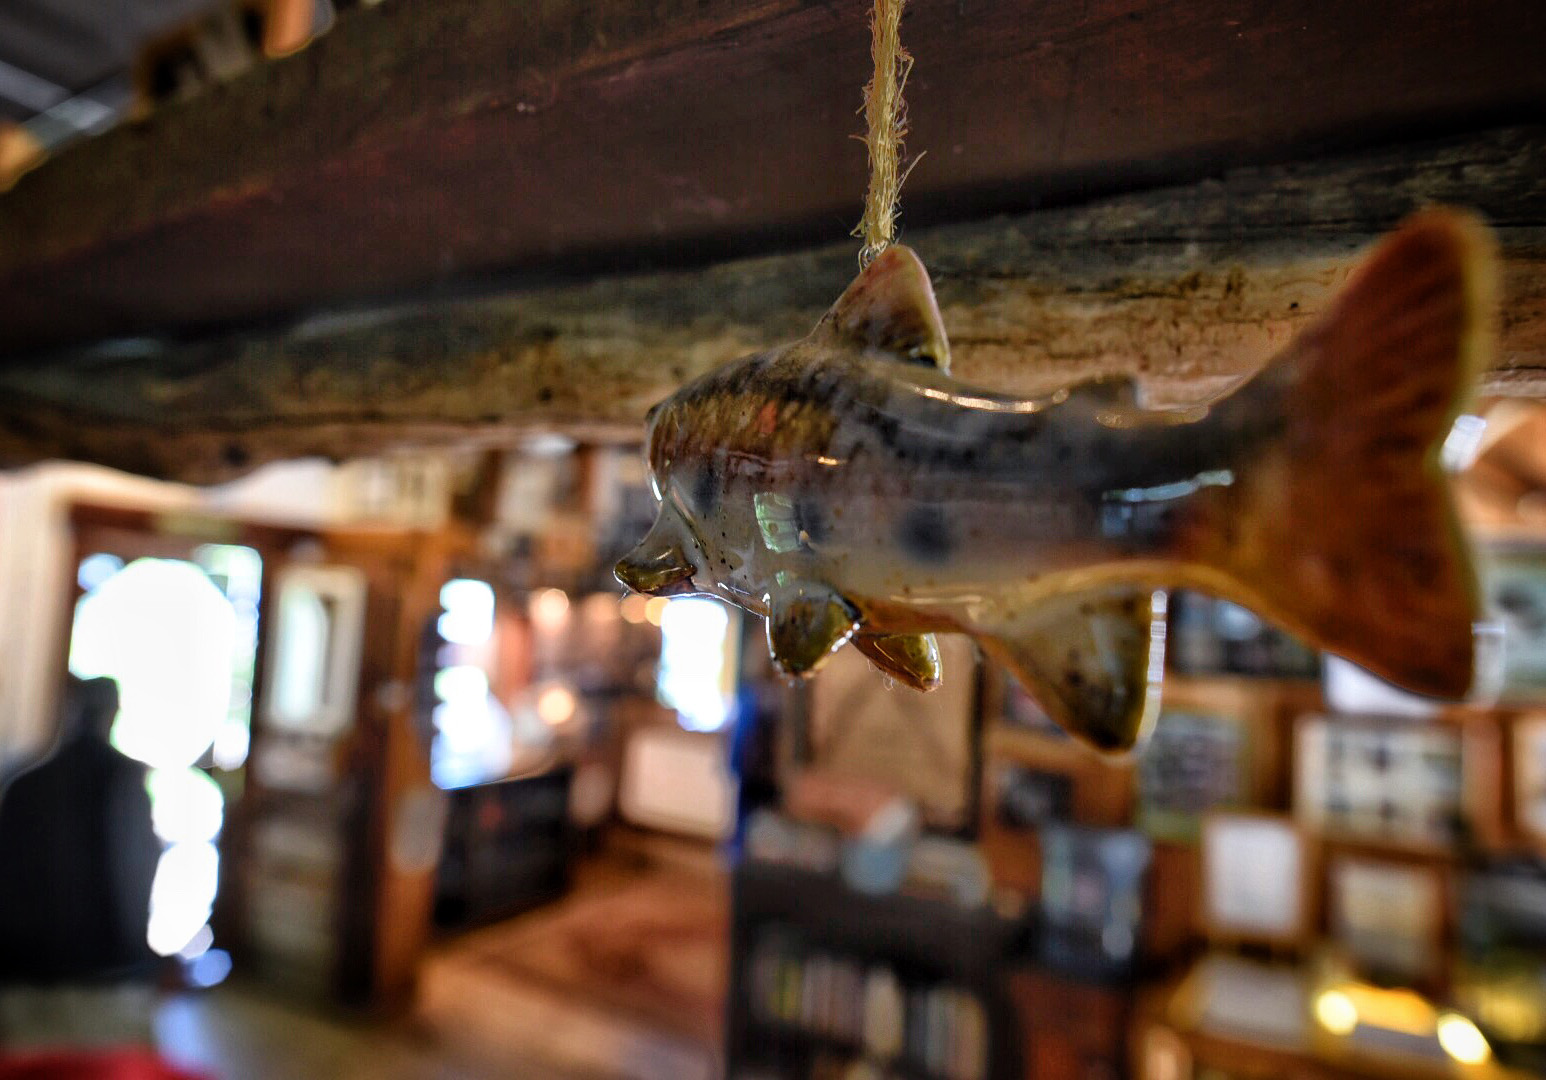 Bar Shop Shopping Wyoming Buffalo Saddlestring Kaycee Clearmont Ucross De Smet Fishing Tackle